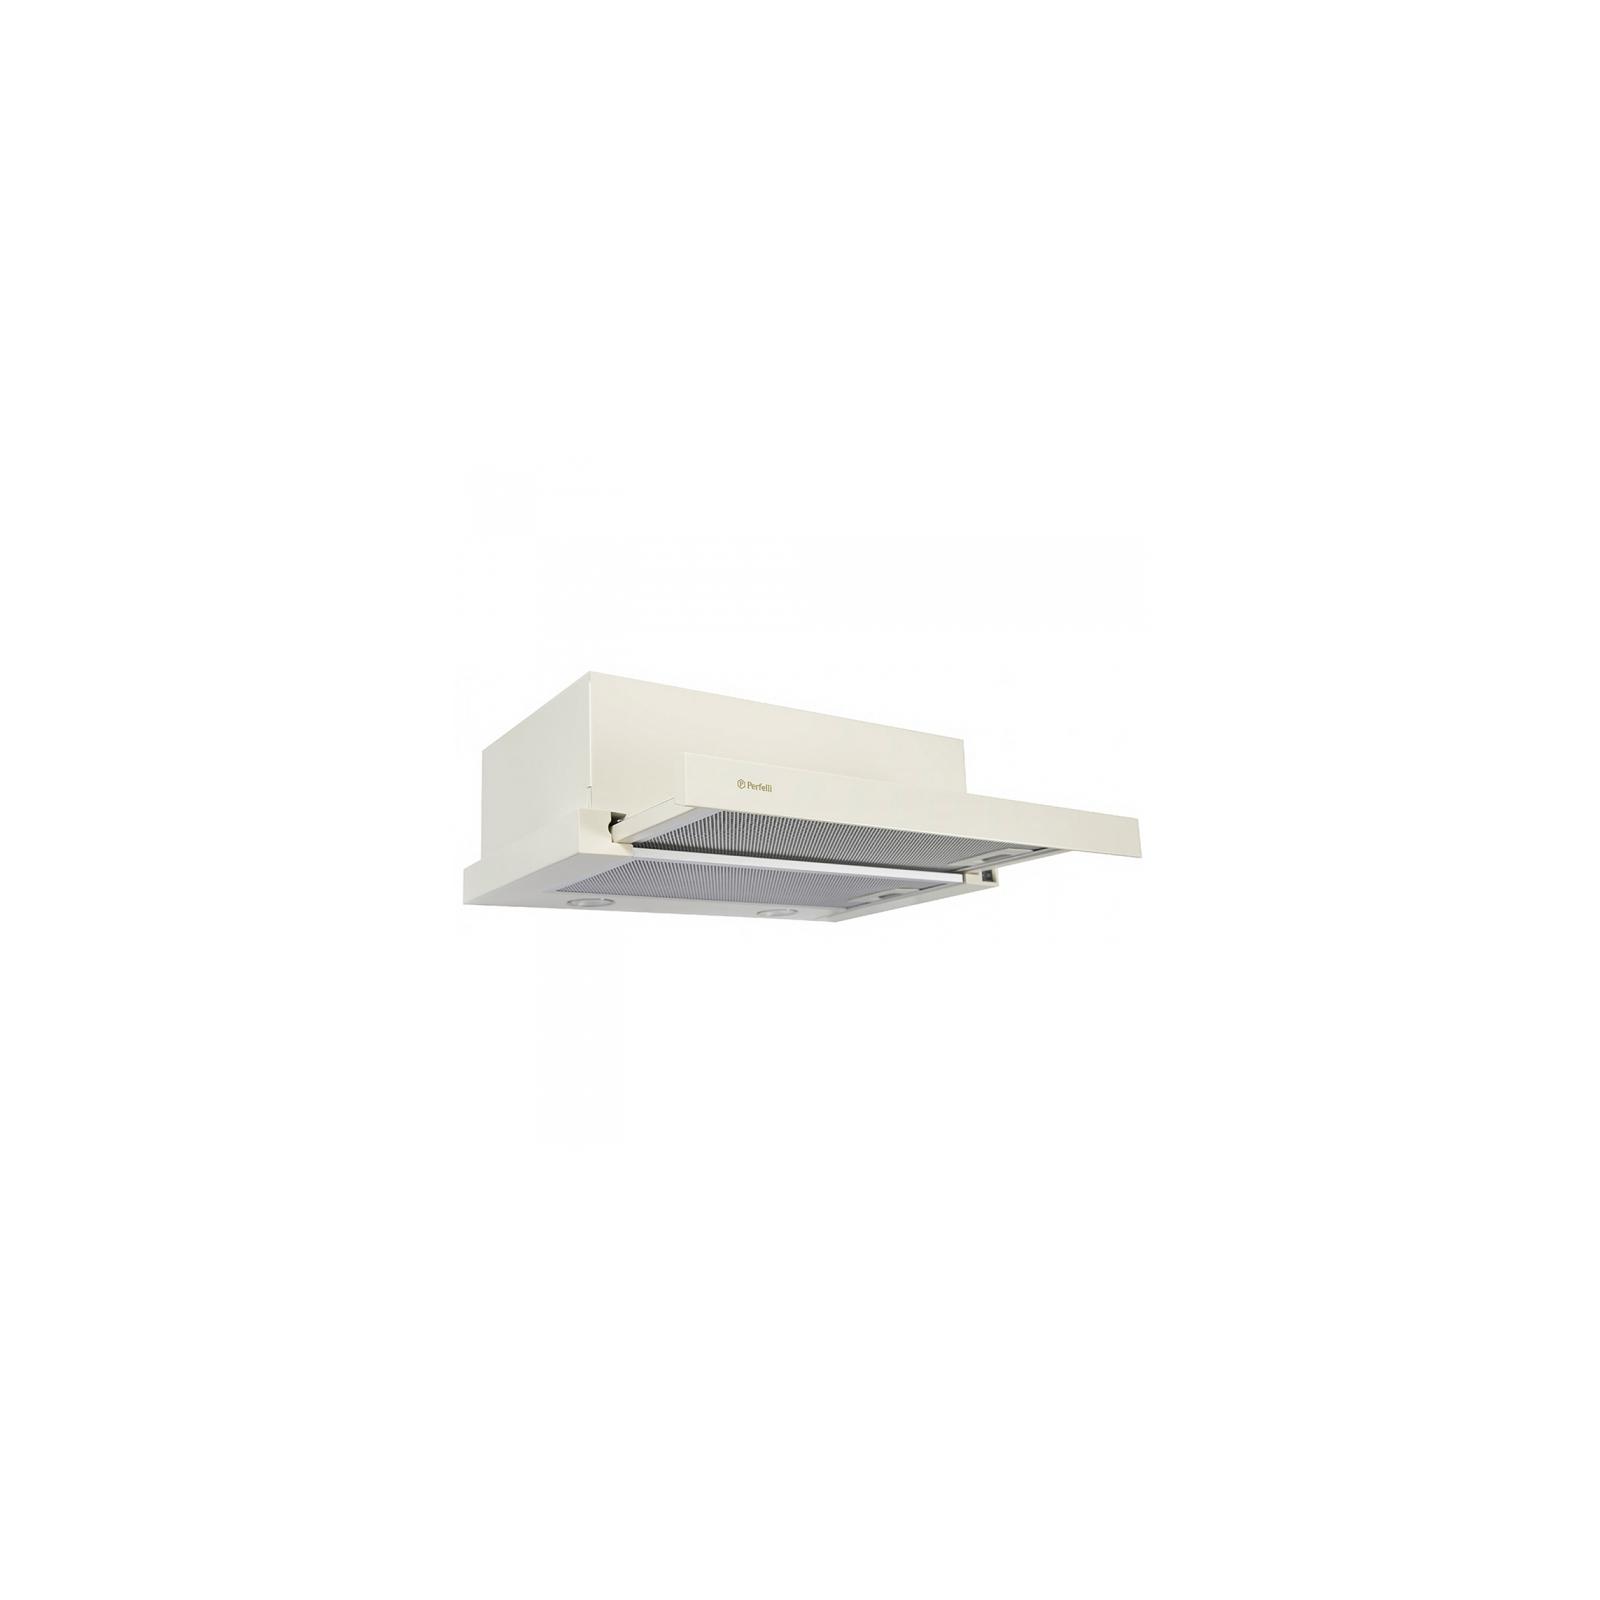 Вытяжка кухонная PERFELLI TL 6612 BL LED изображение 2